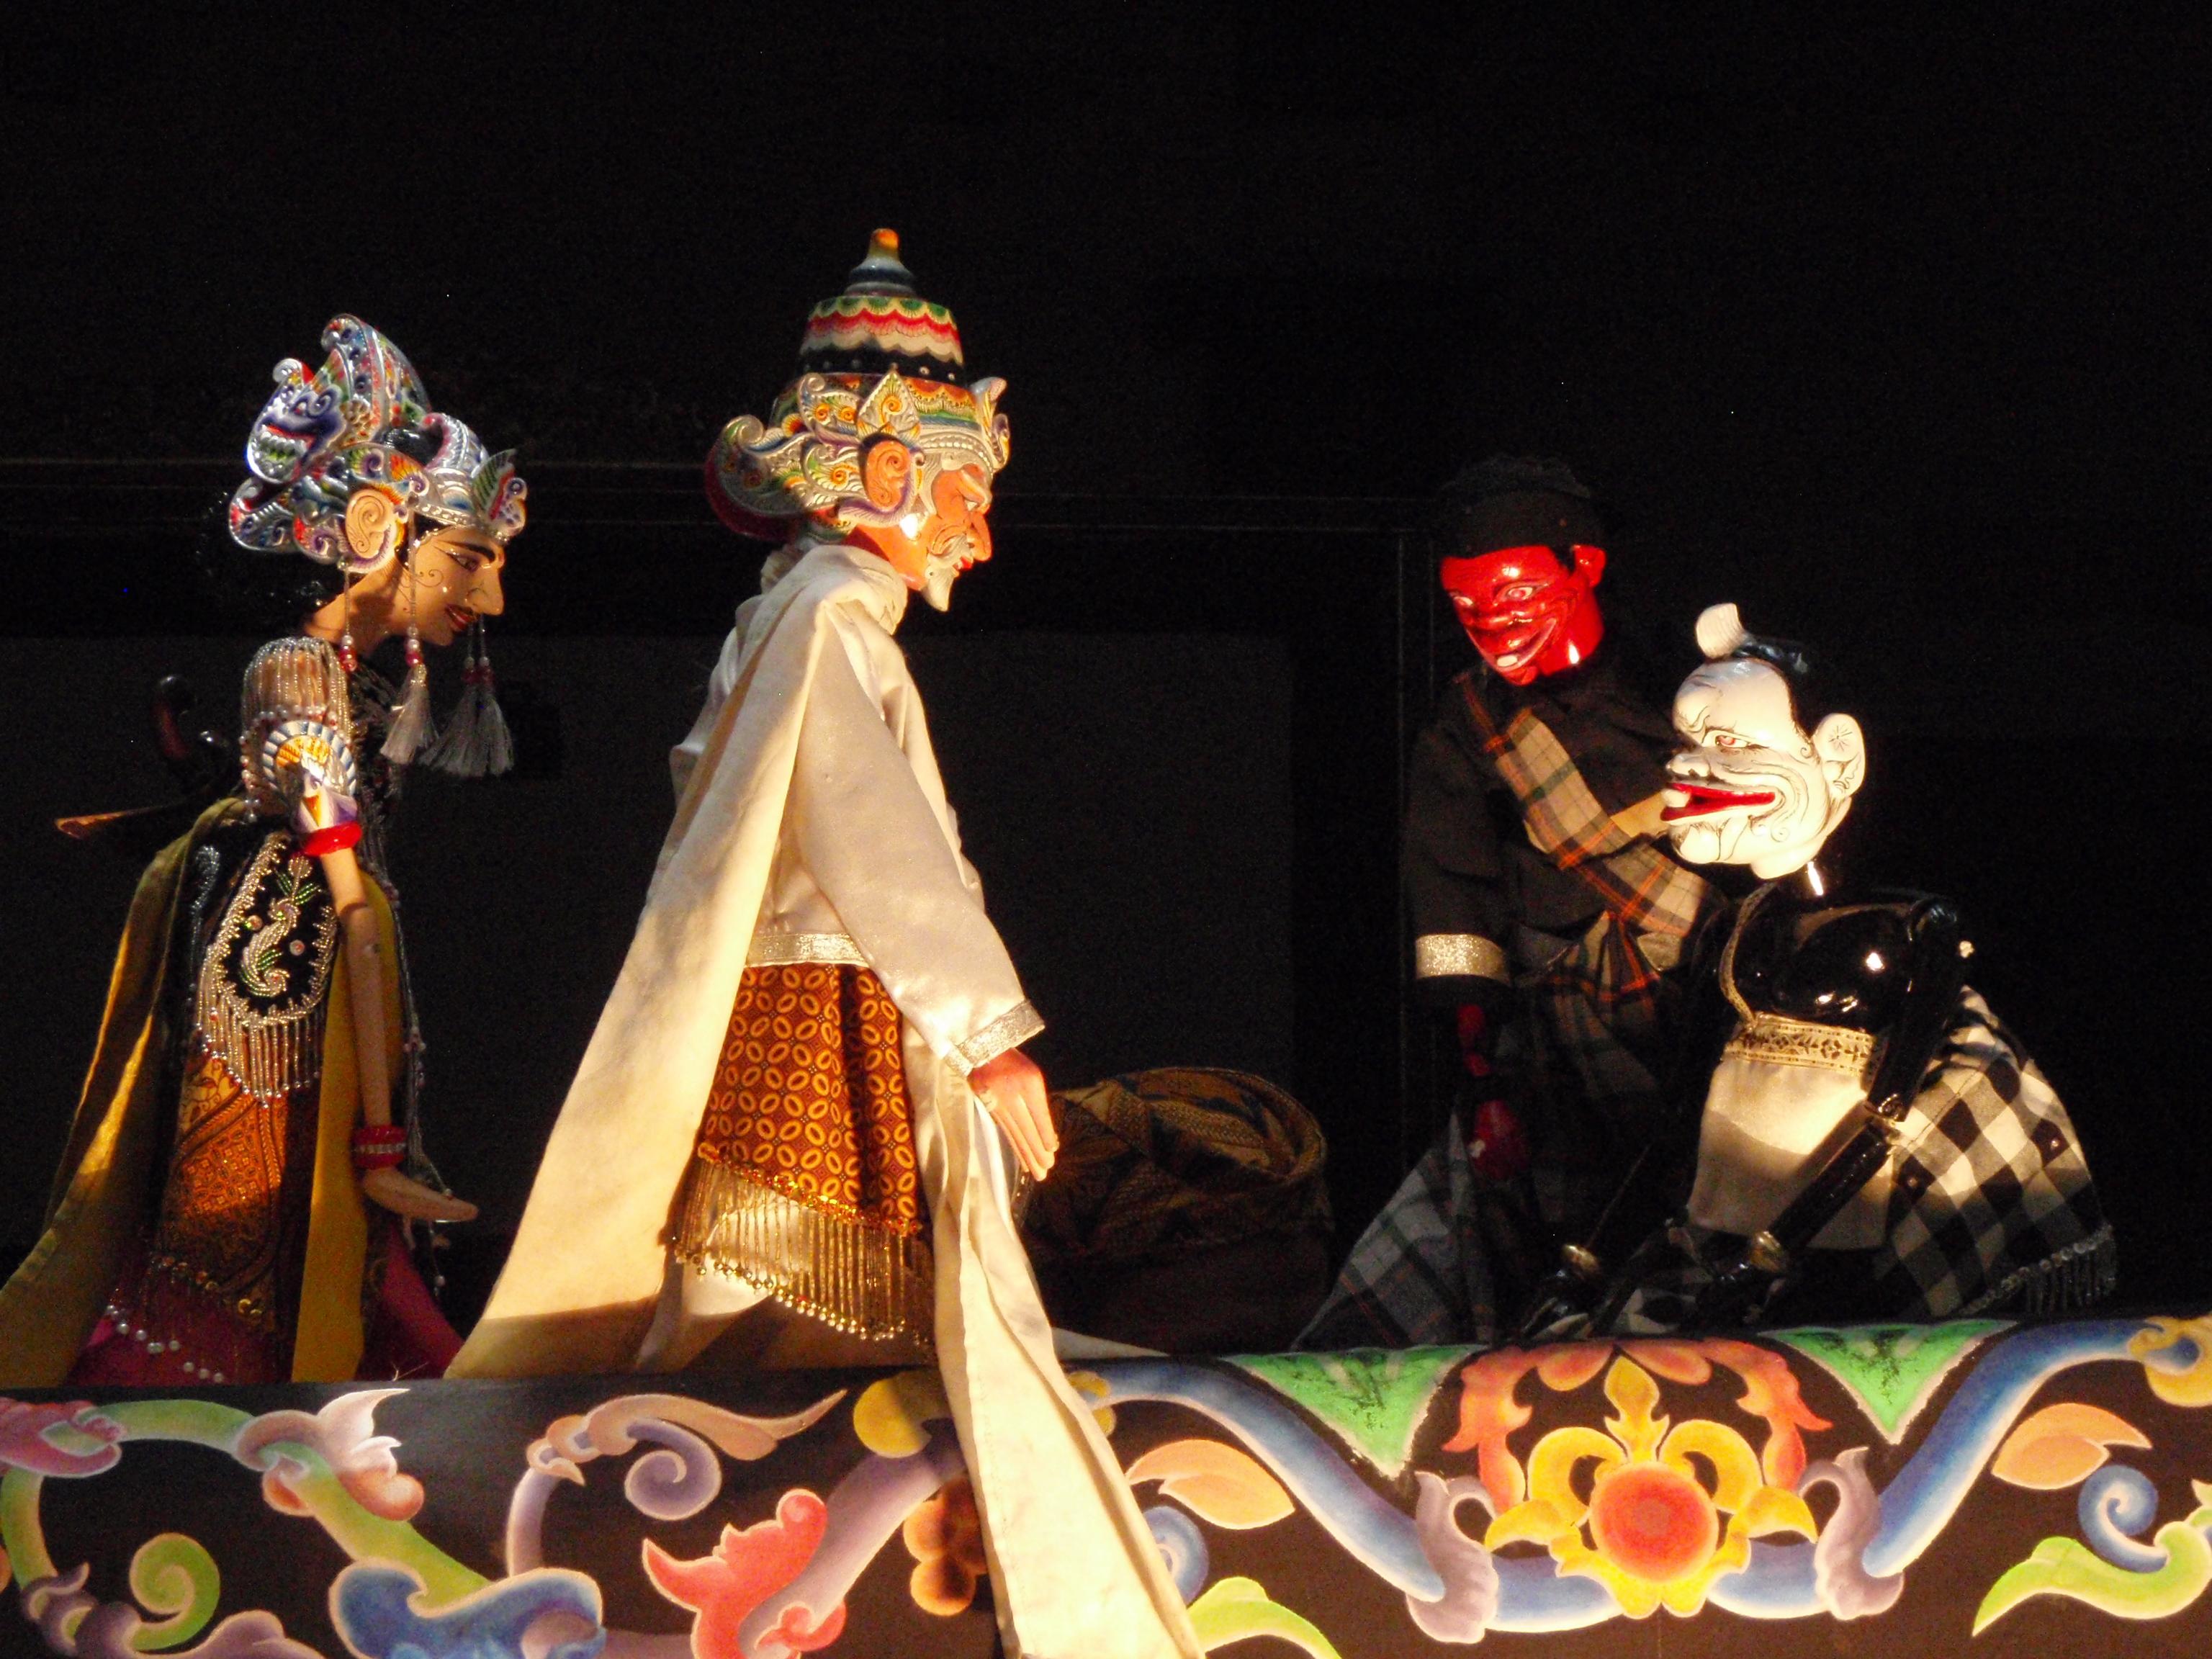 Semar avec d'autres personnages, <em><em>wayang</em> golek <em>Sunda</em></em>, Java occidental, Indonésie. Photo: Karen Smith